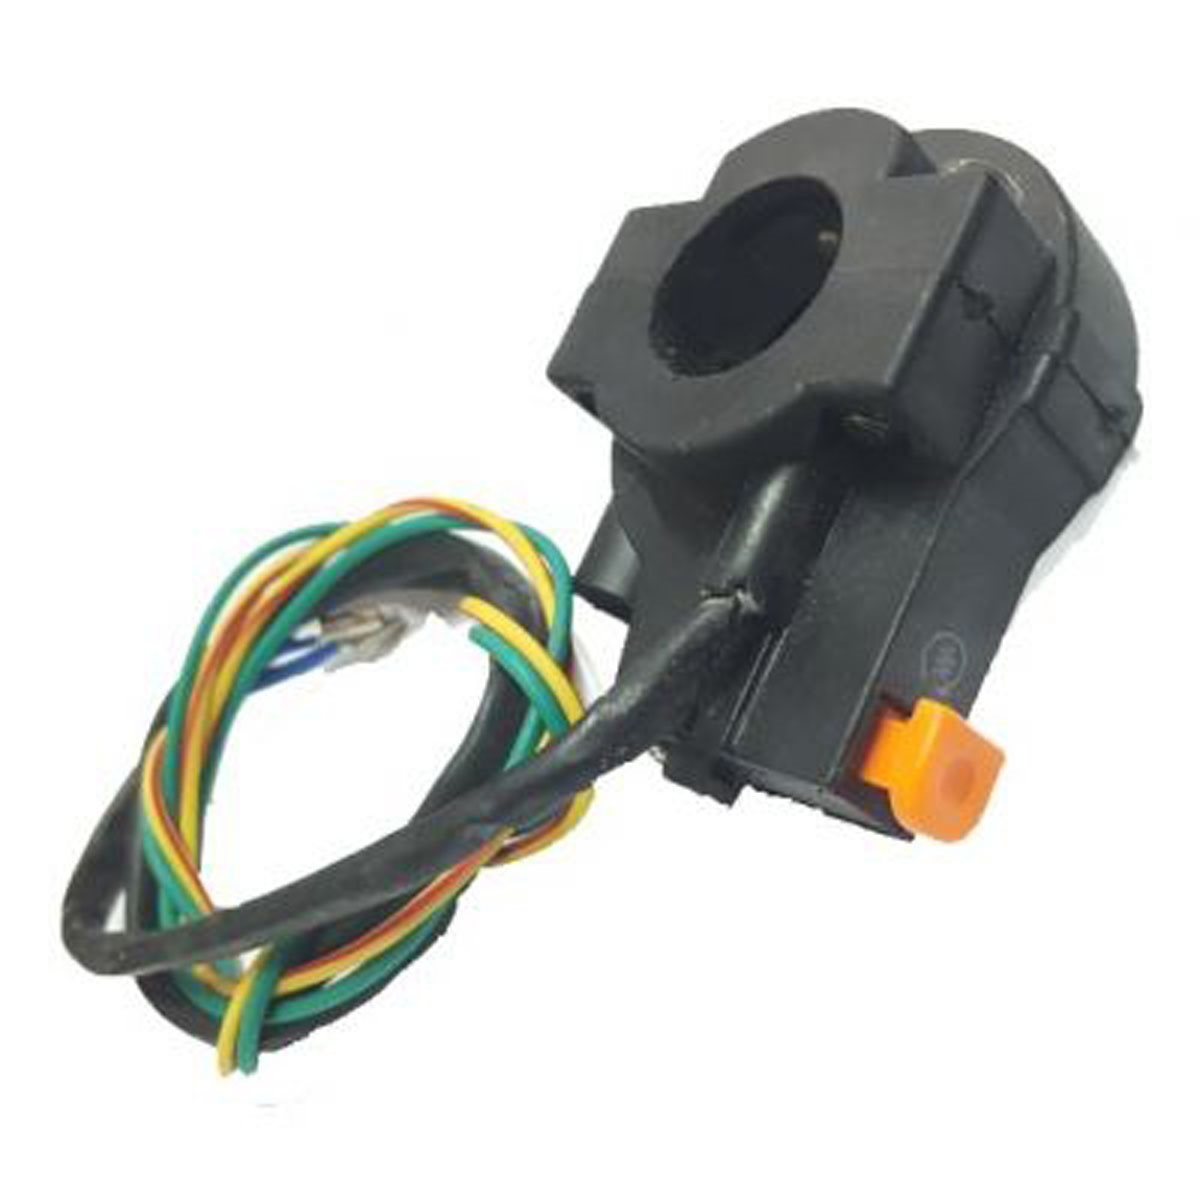 Interruptor do Acelerador da Bicicleta Motorizada Moskito